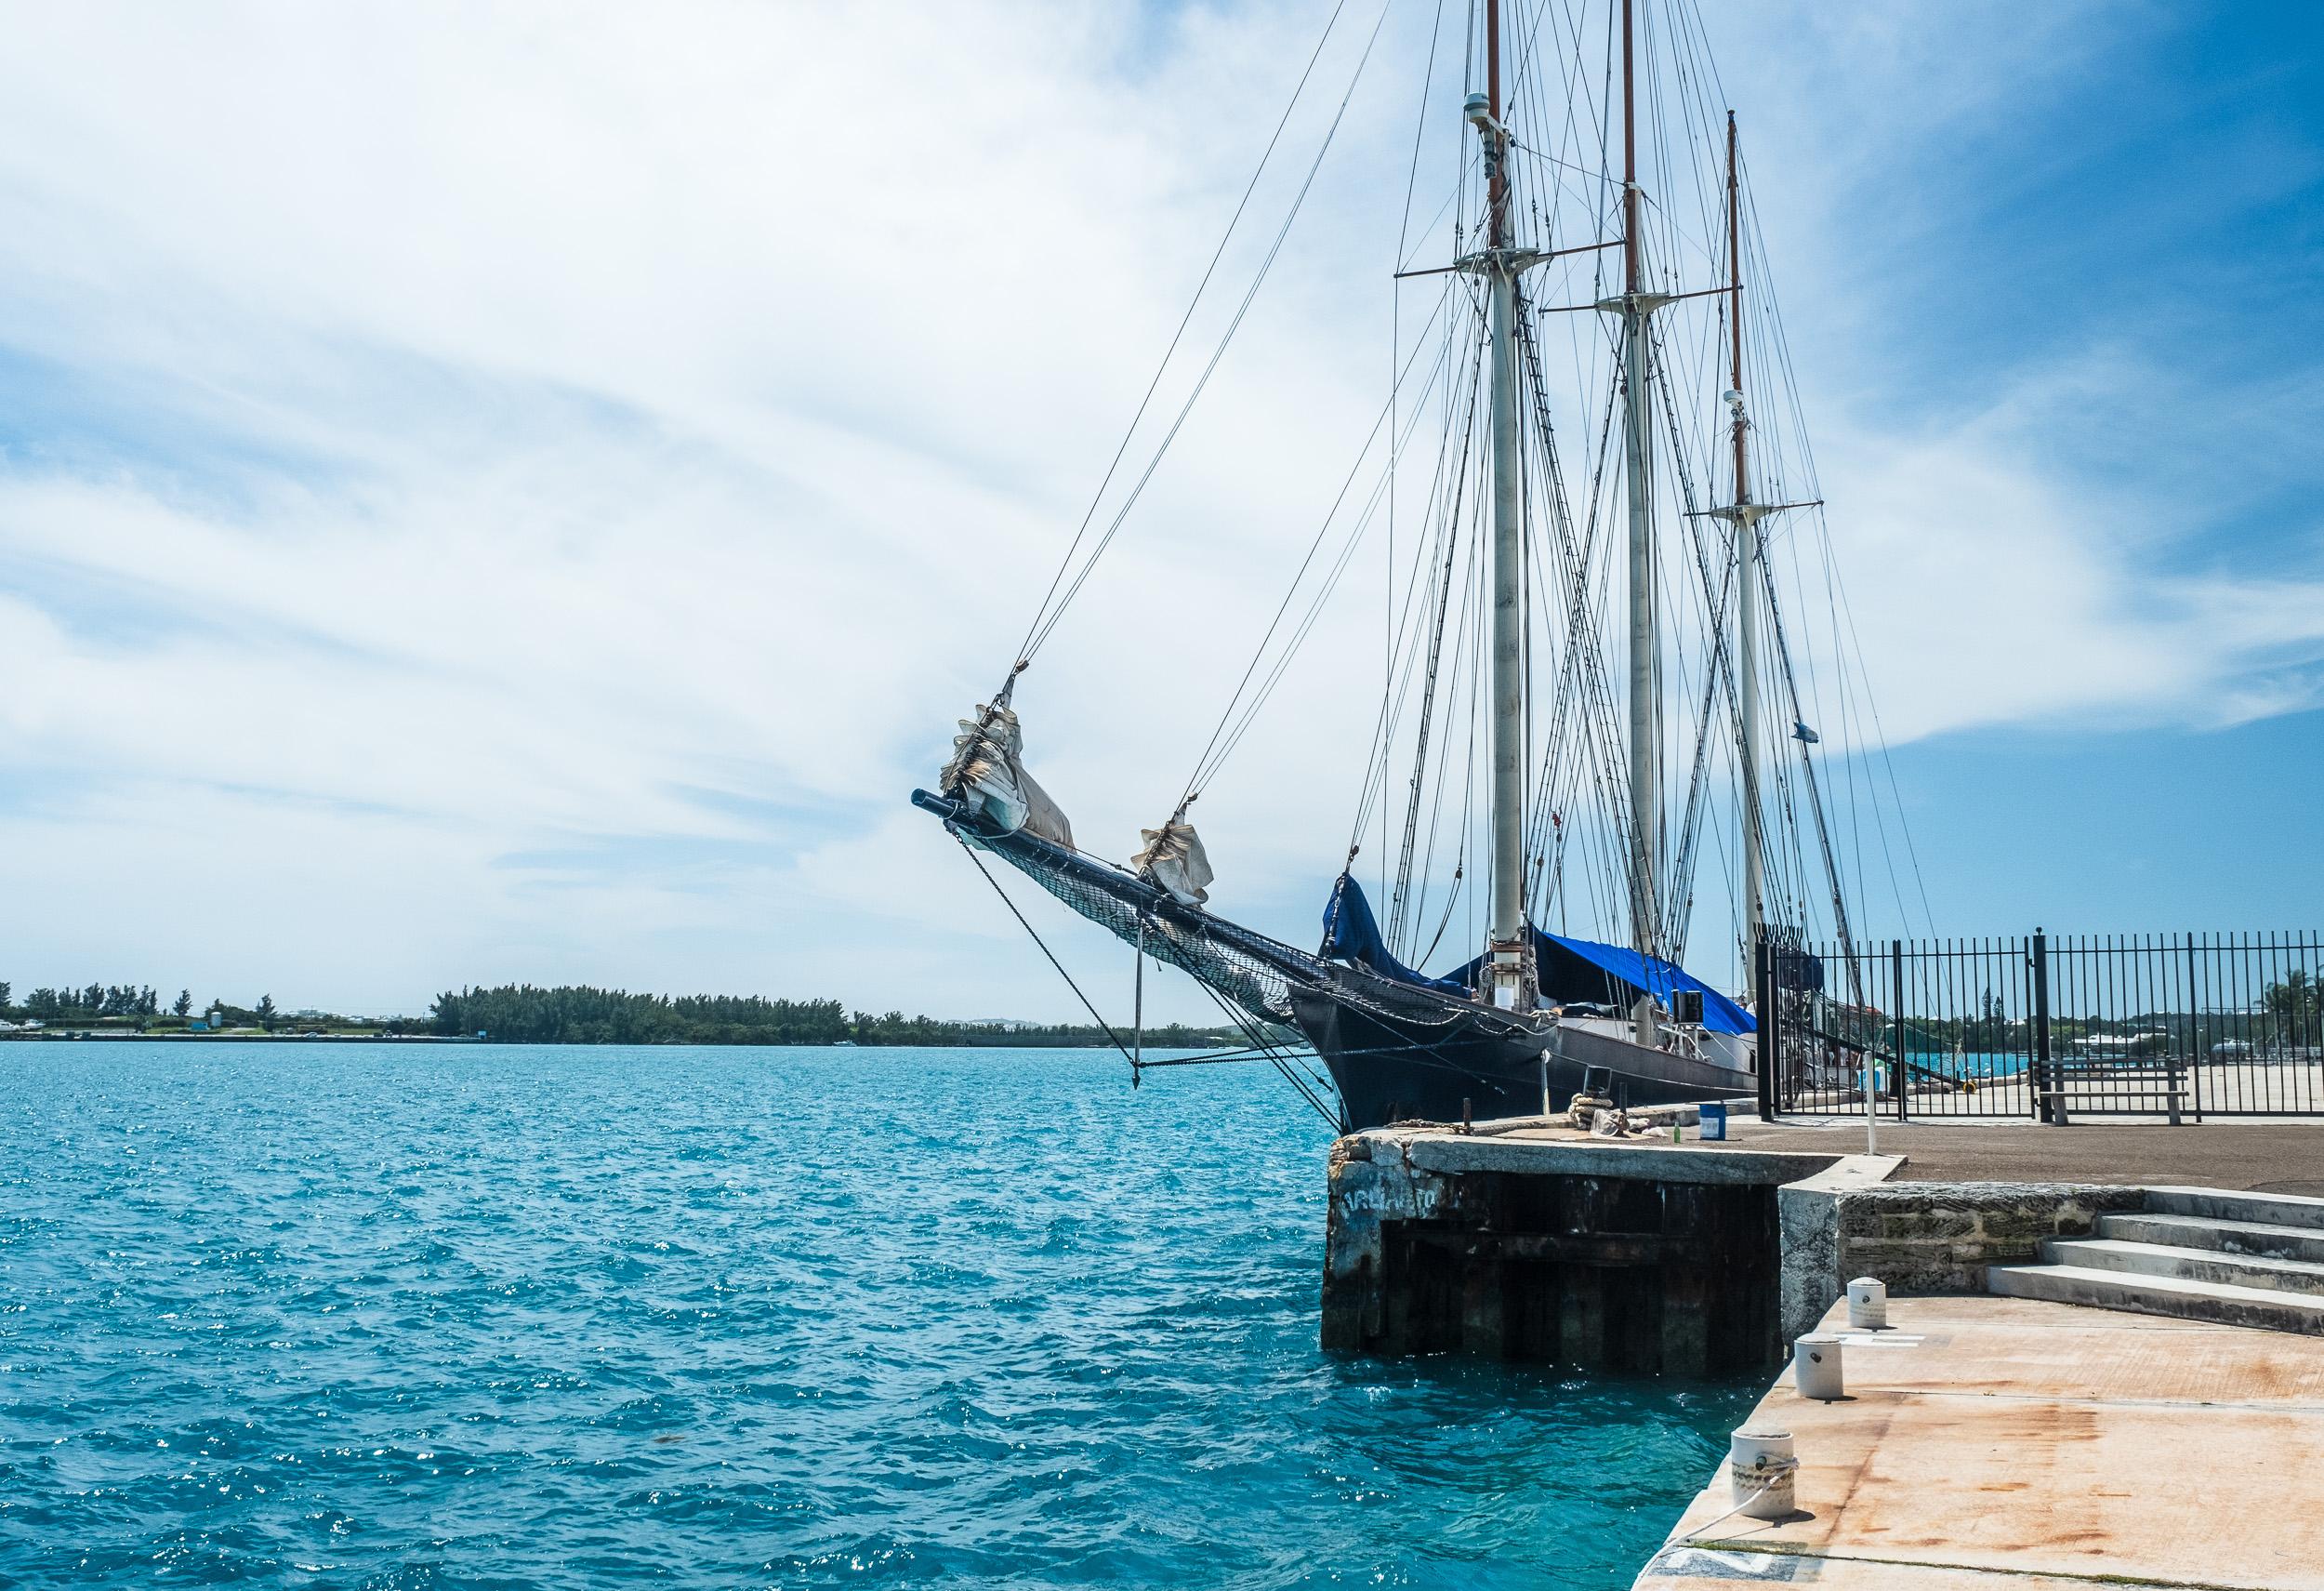 Blue Clipper at dock